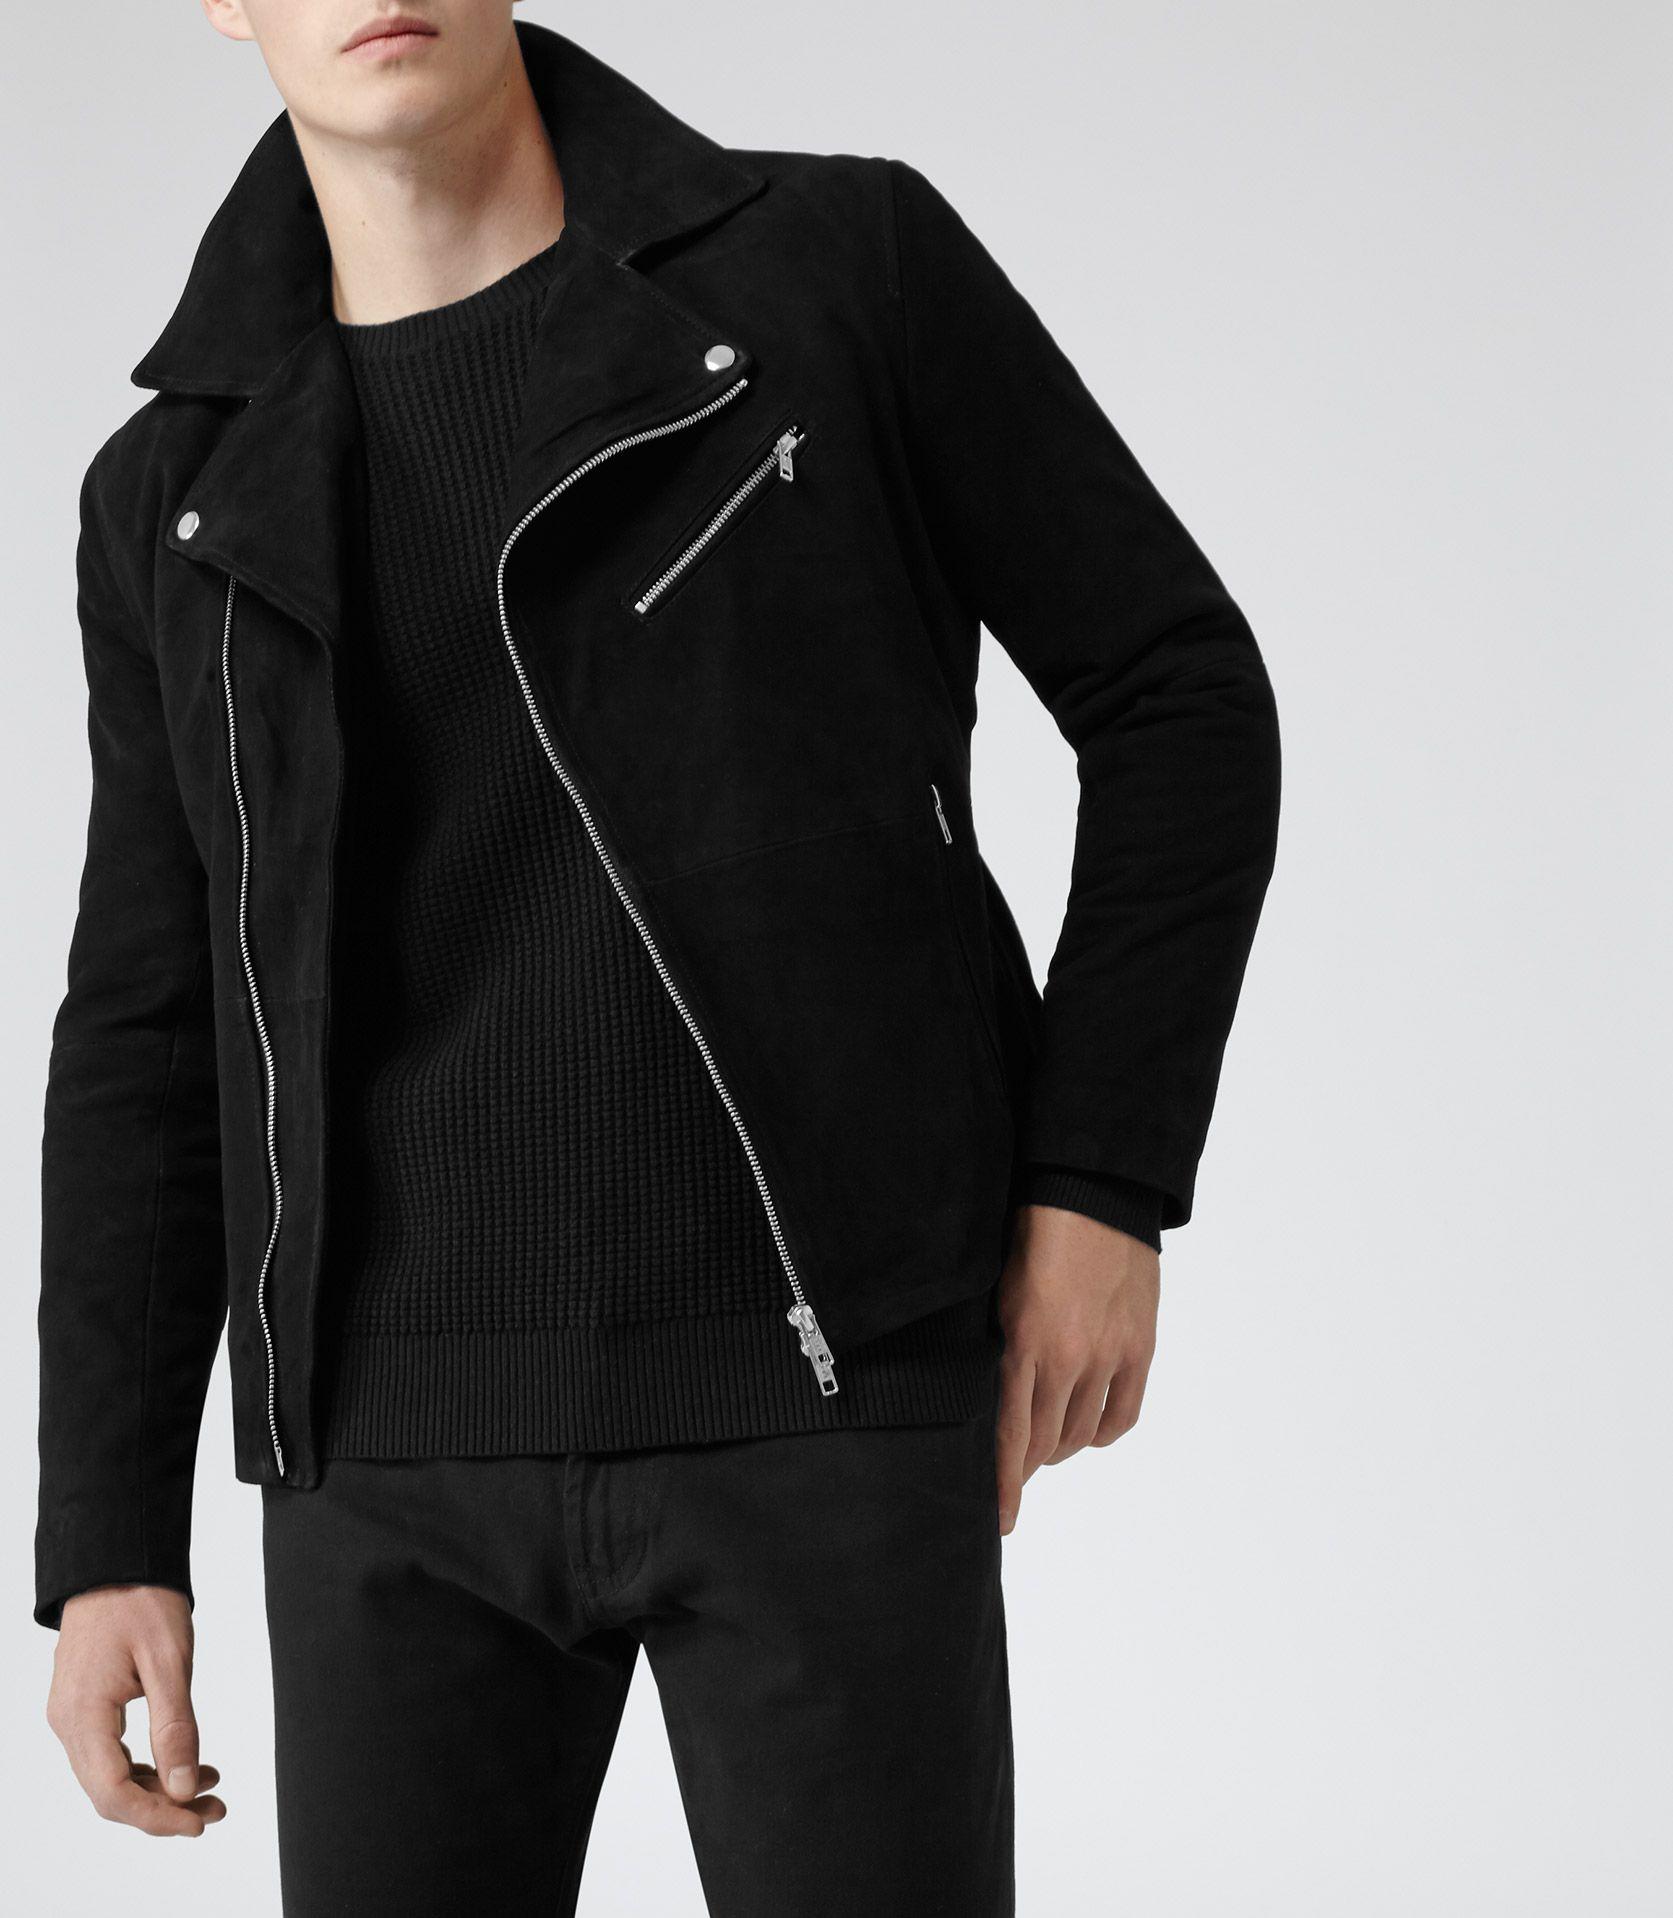 Chic-suede-jackets-mens | Clothes | Pinterest | Black suede ...